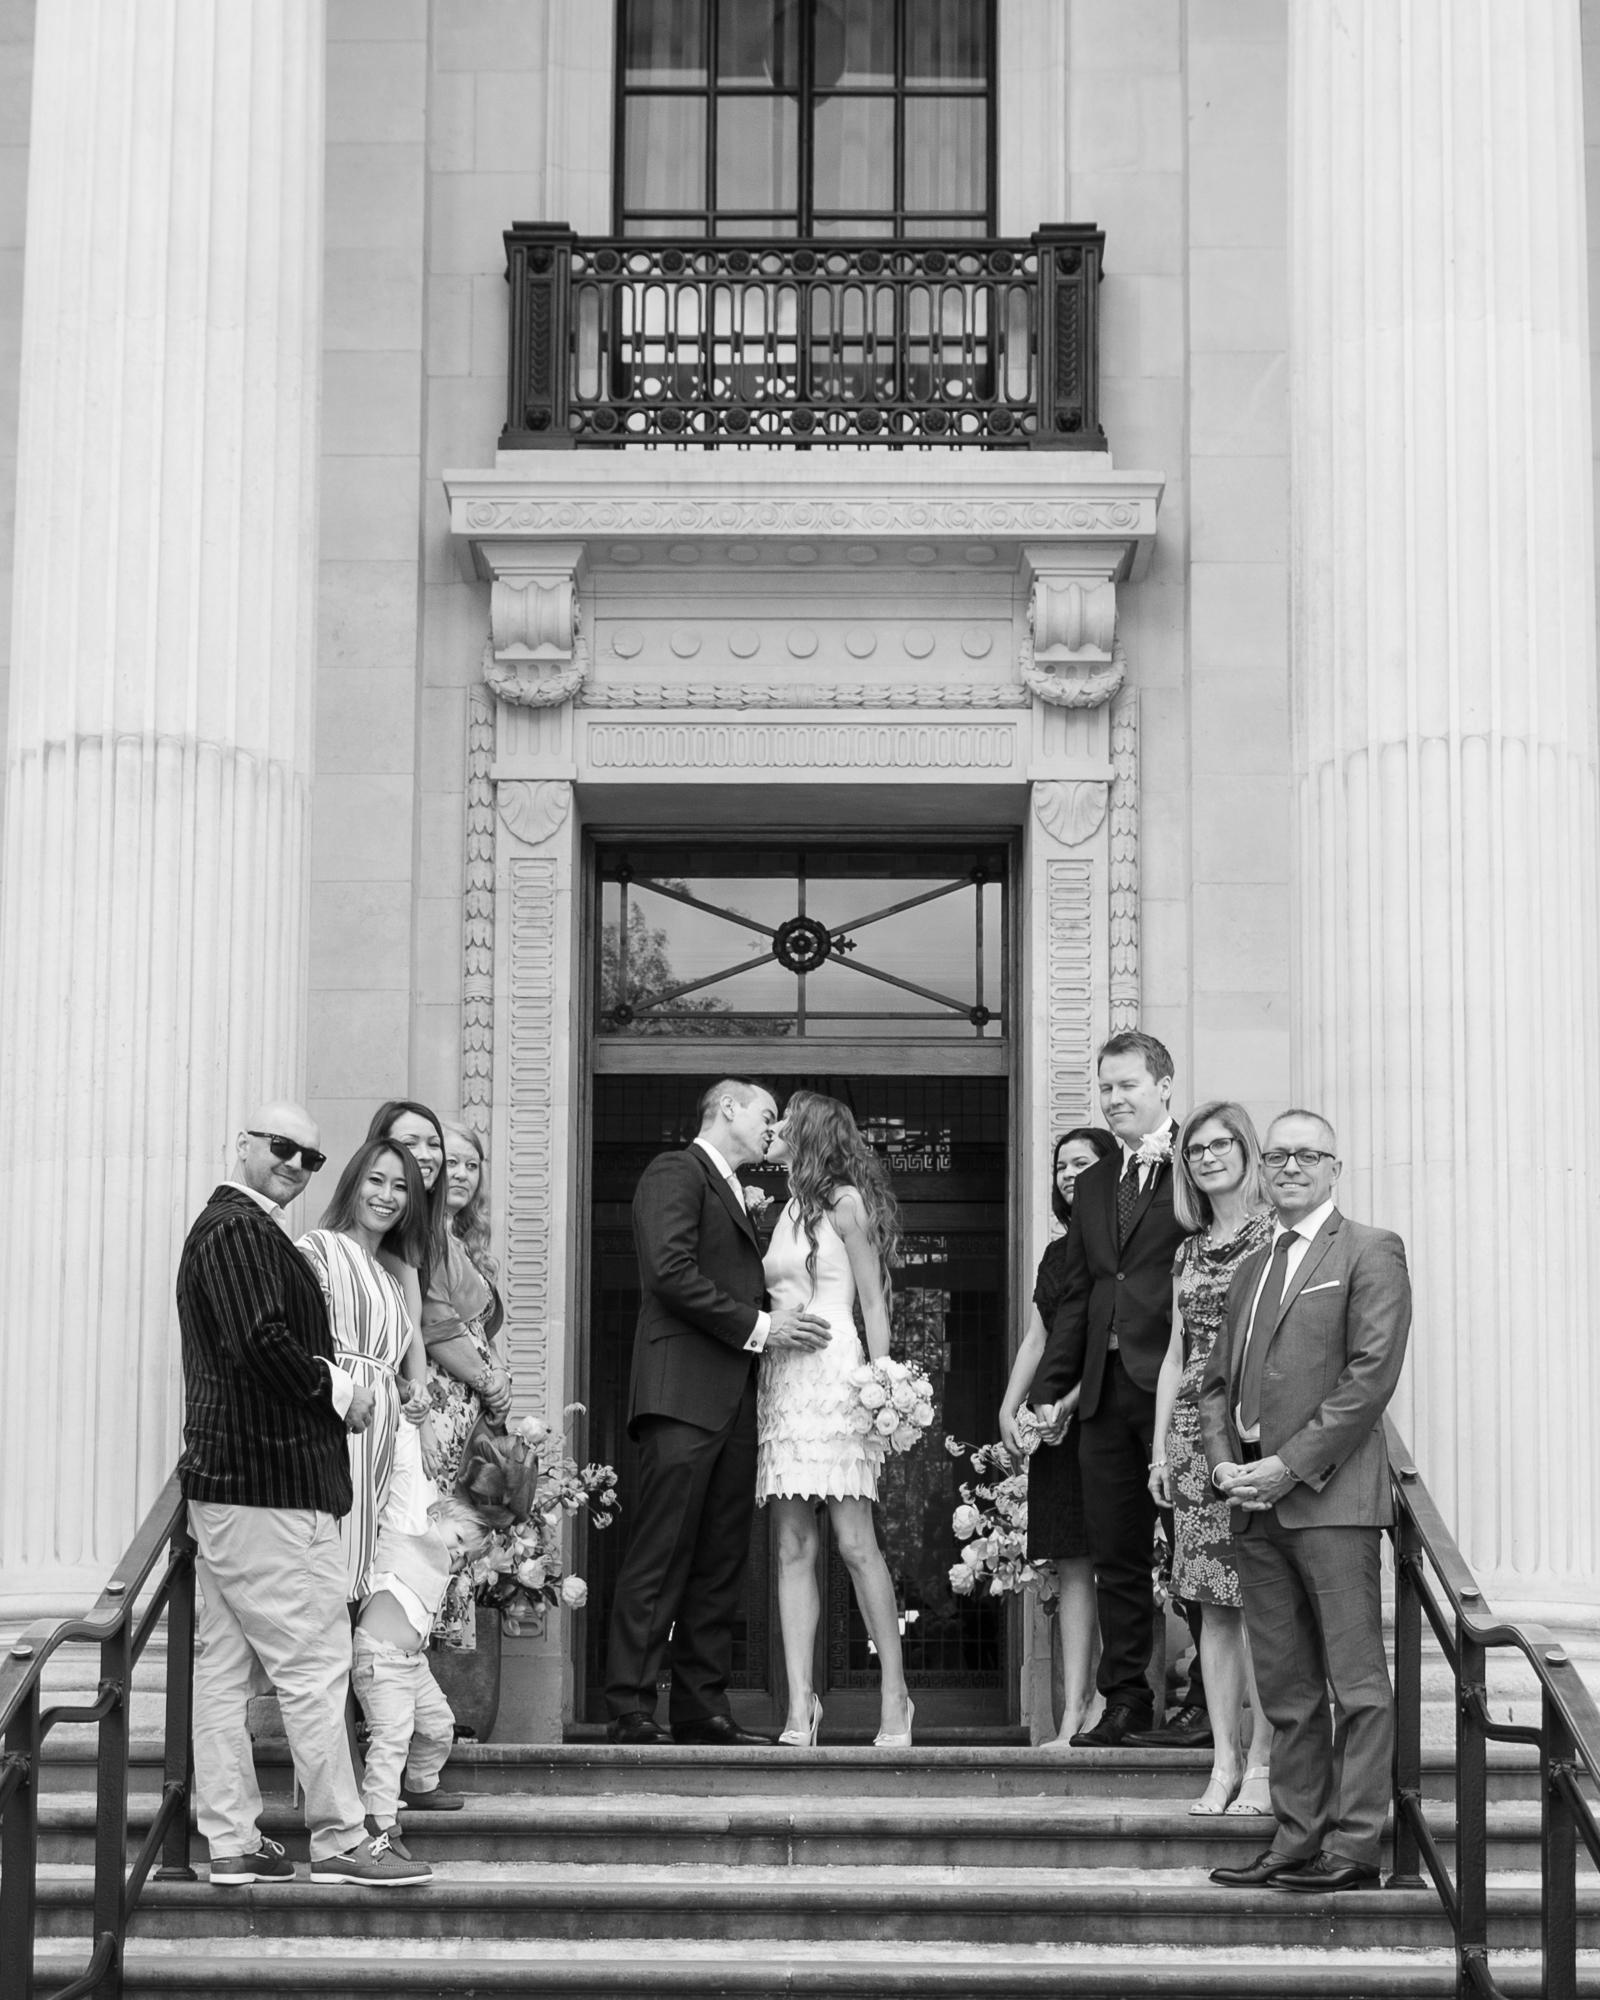 Kiss_the_Bride_Marylebone_Registry_Office_London_Wedding_Group_Natural_Fun_Rachel_Thornhill_Photogra